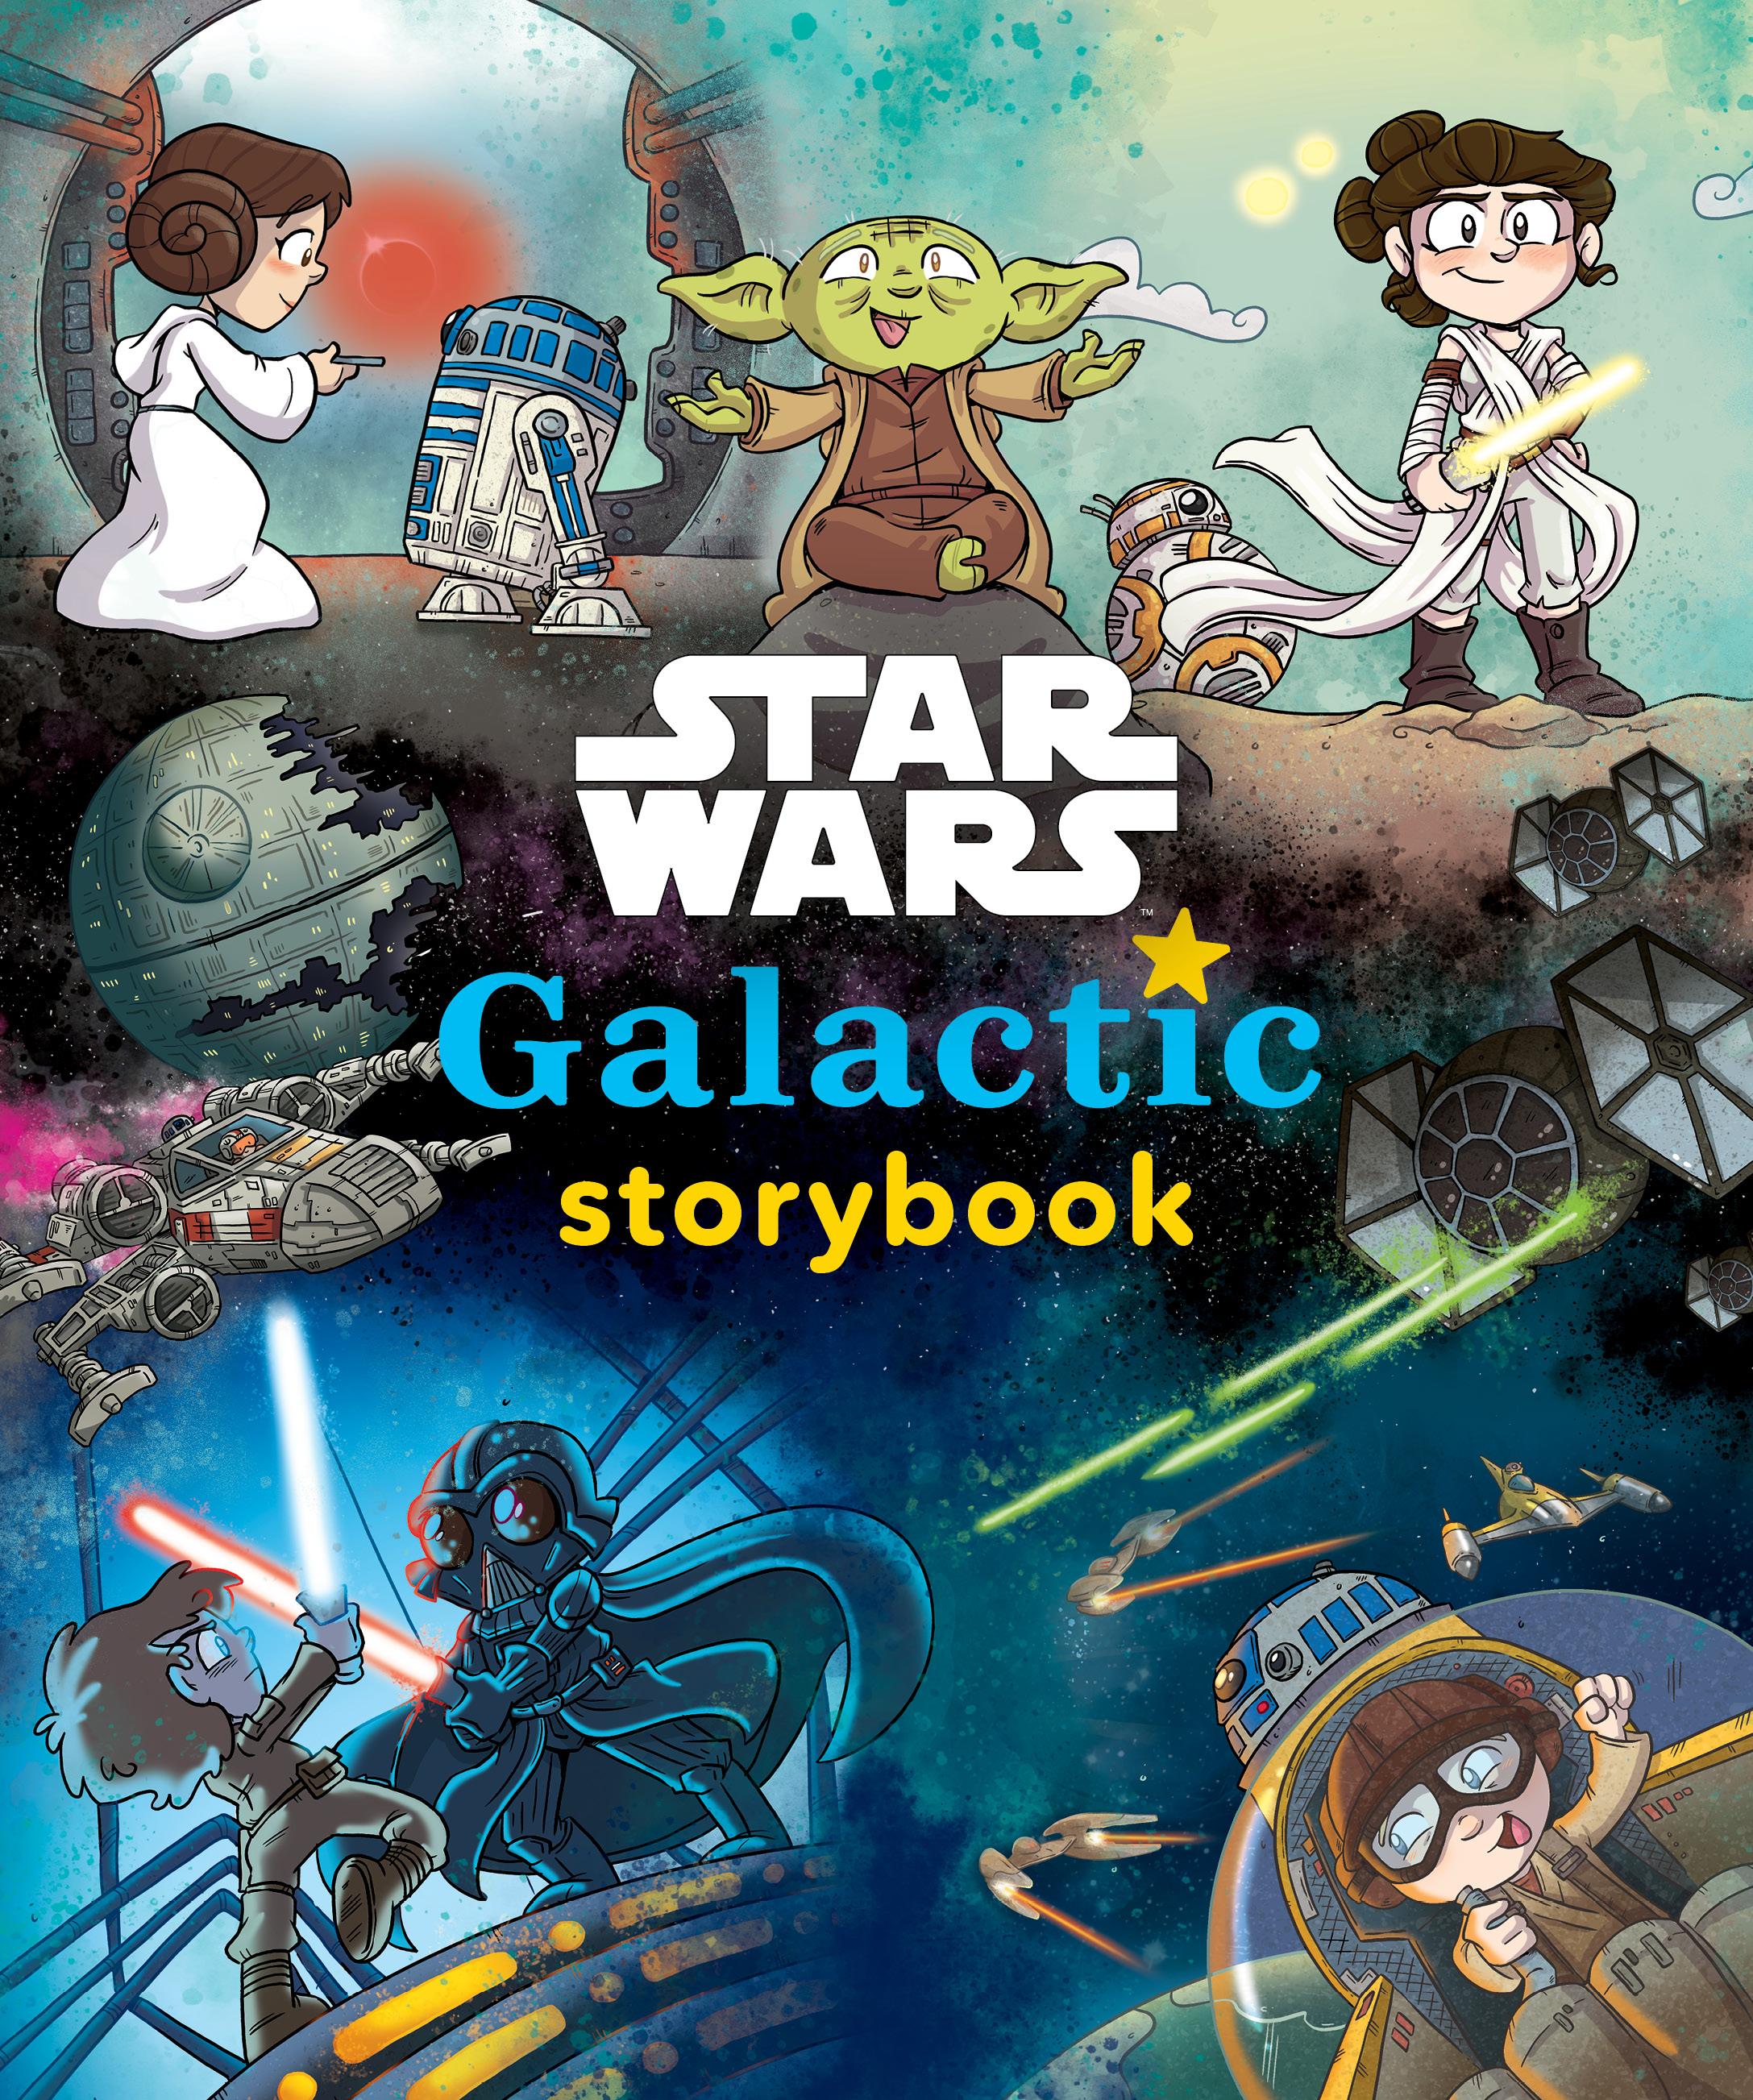 Galactic Storybook cover.jpg